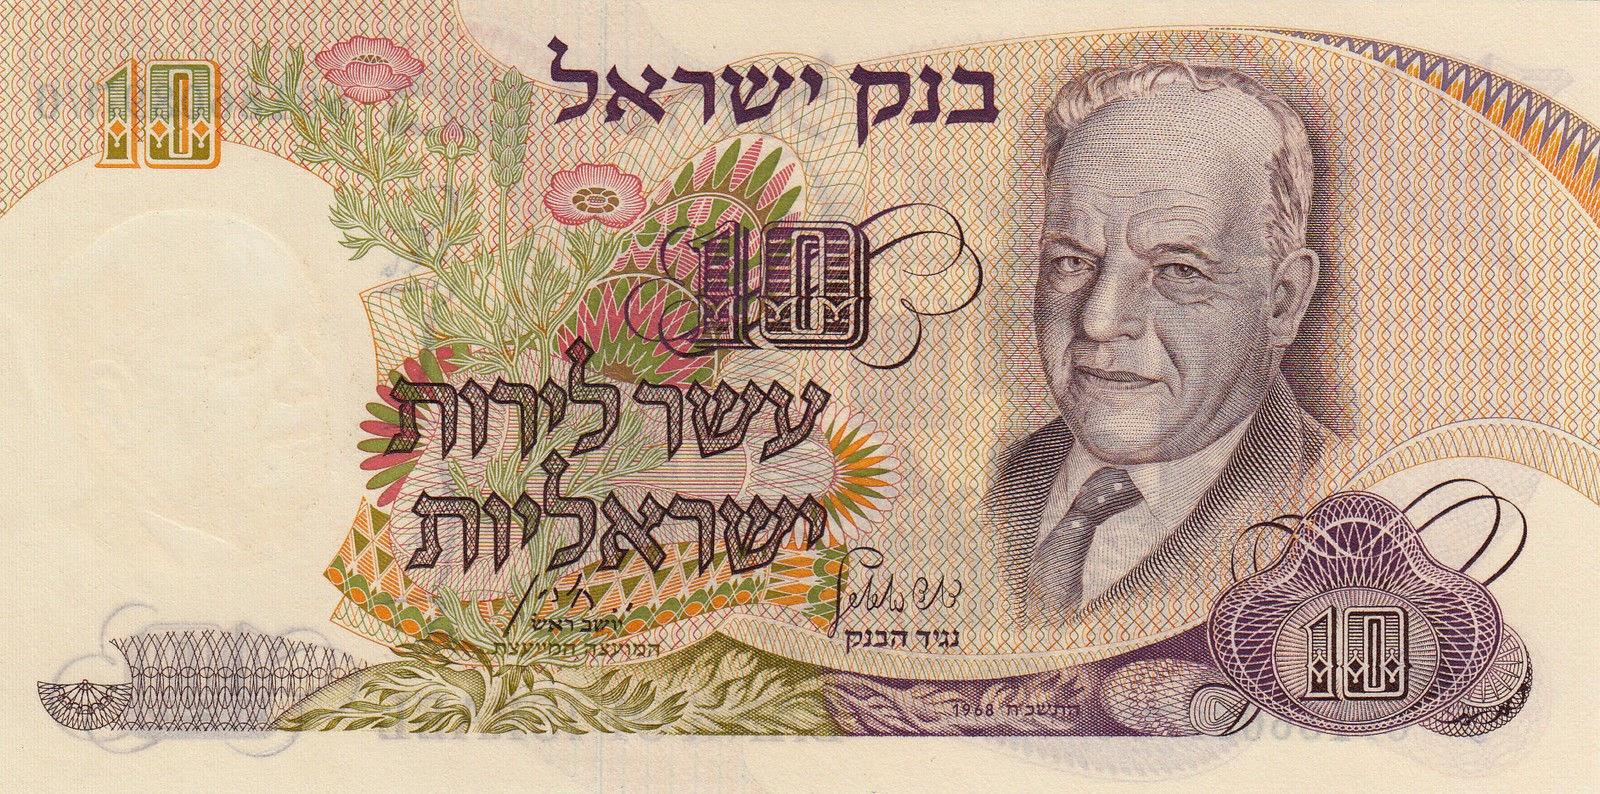 Israel Banknotes 10 Israeli Pounds 1968 Chaim Nachman Bialik